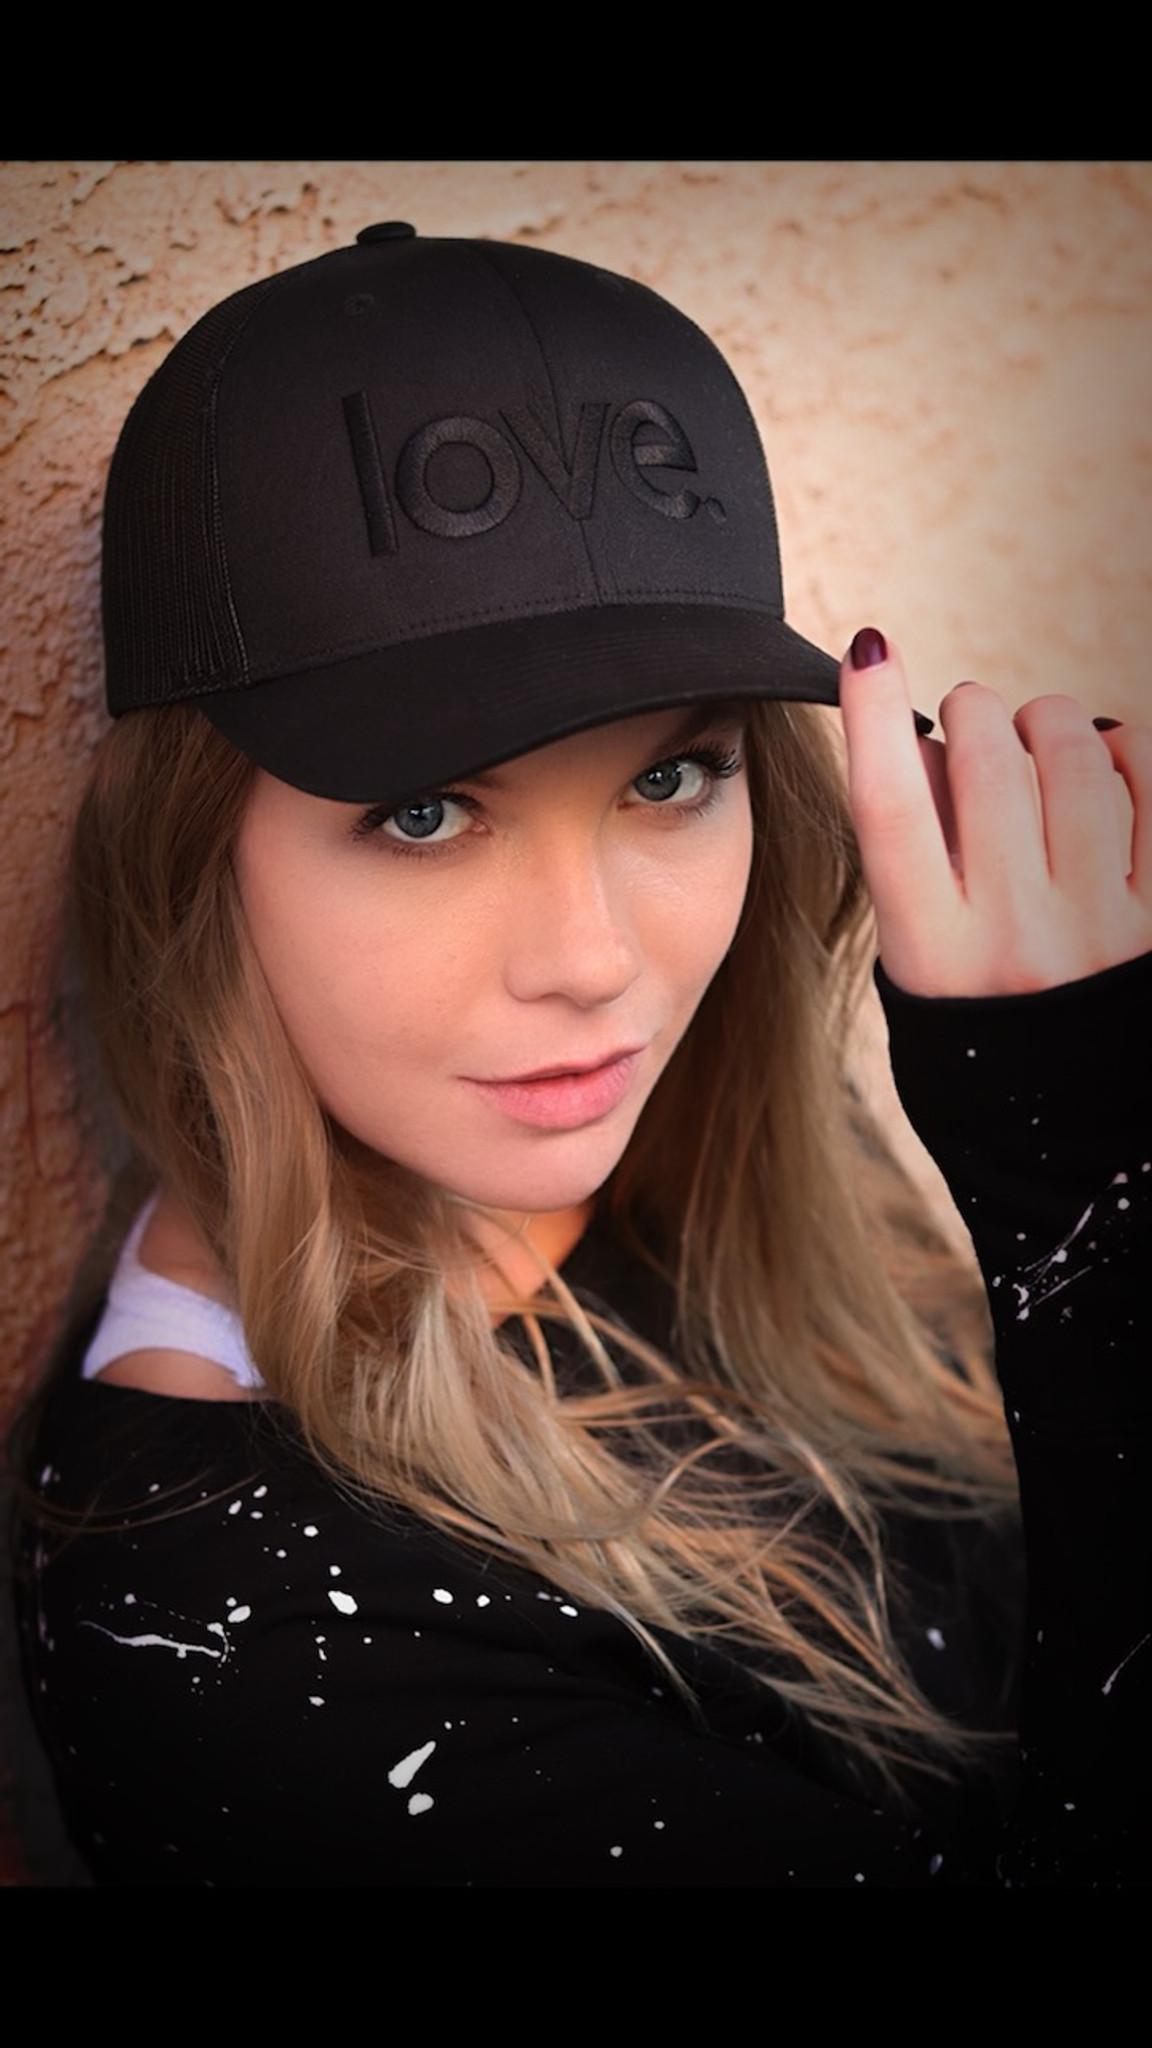 LOVE. EMBROIDERED TRUCKER HAT BLACK ON BLACK